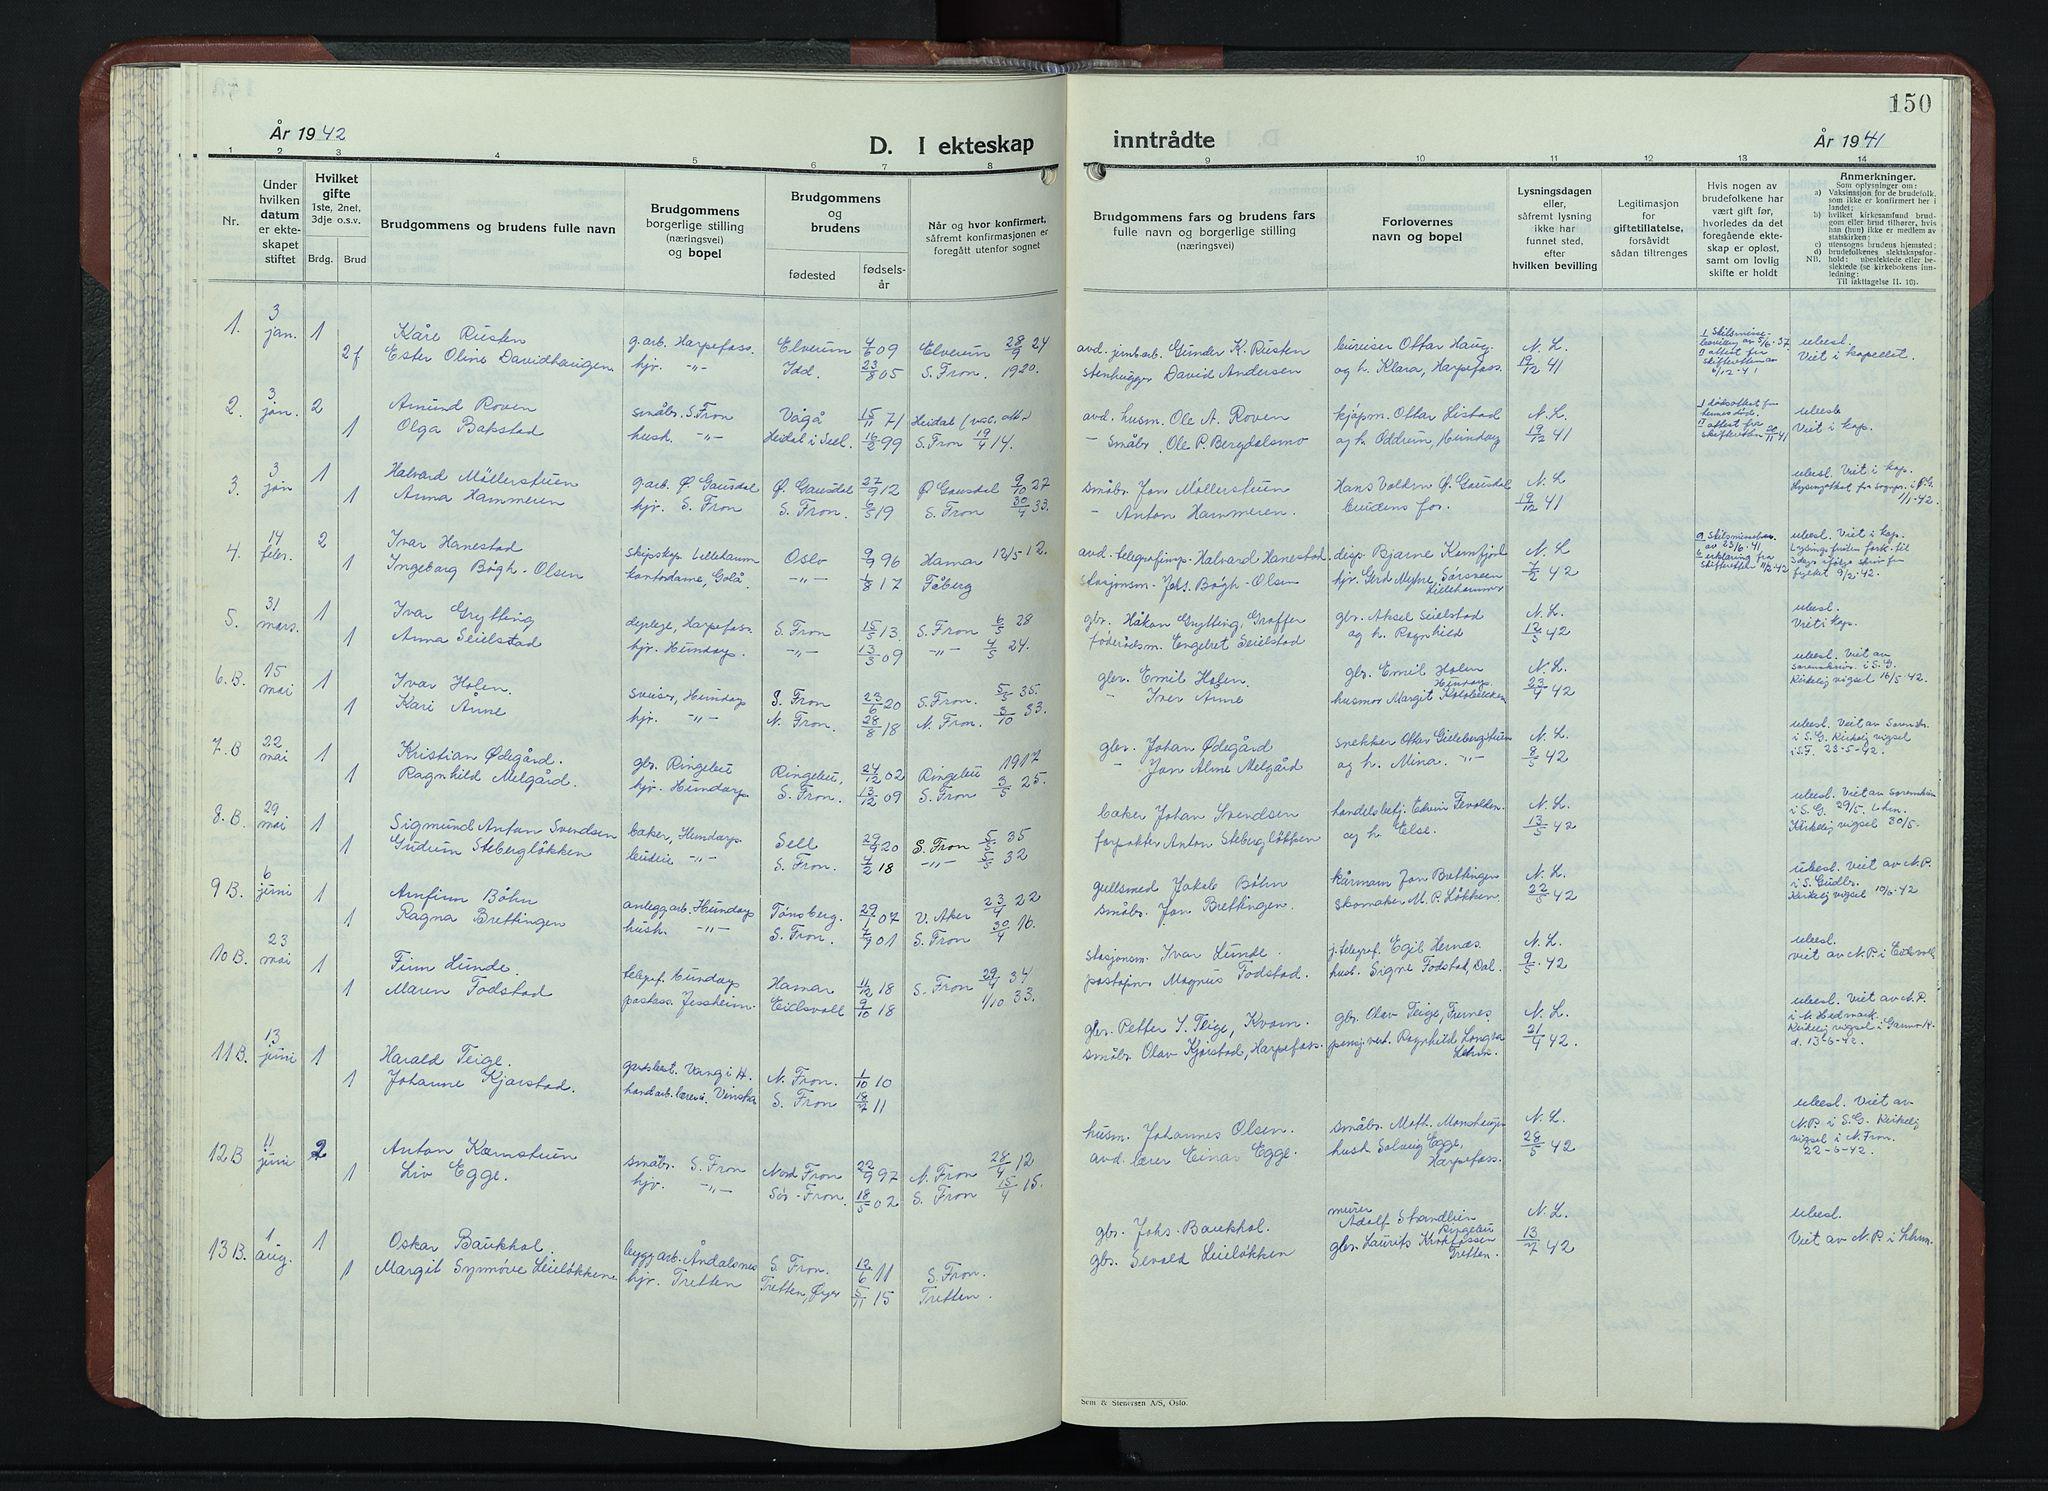 SAH, Sør-Fron prestekontor, H/Ha/Hab/L0006: Klokkerbok nr. 6, 1933-1948, s. 150